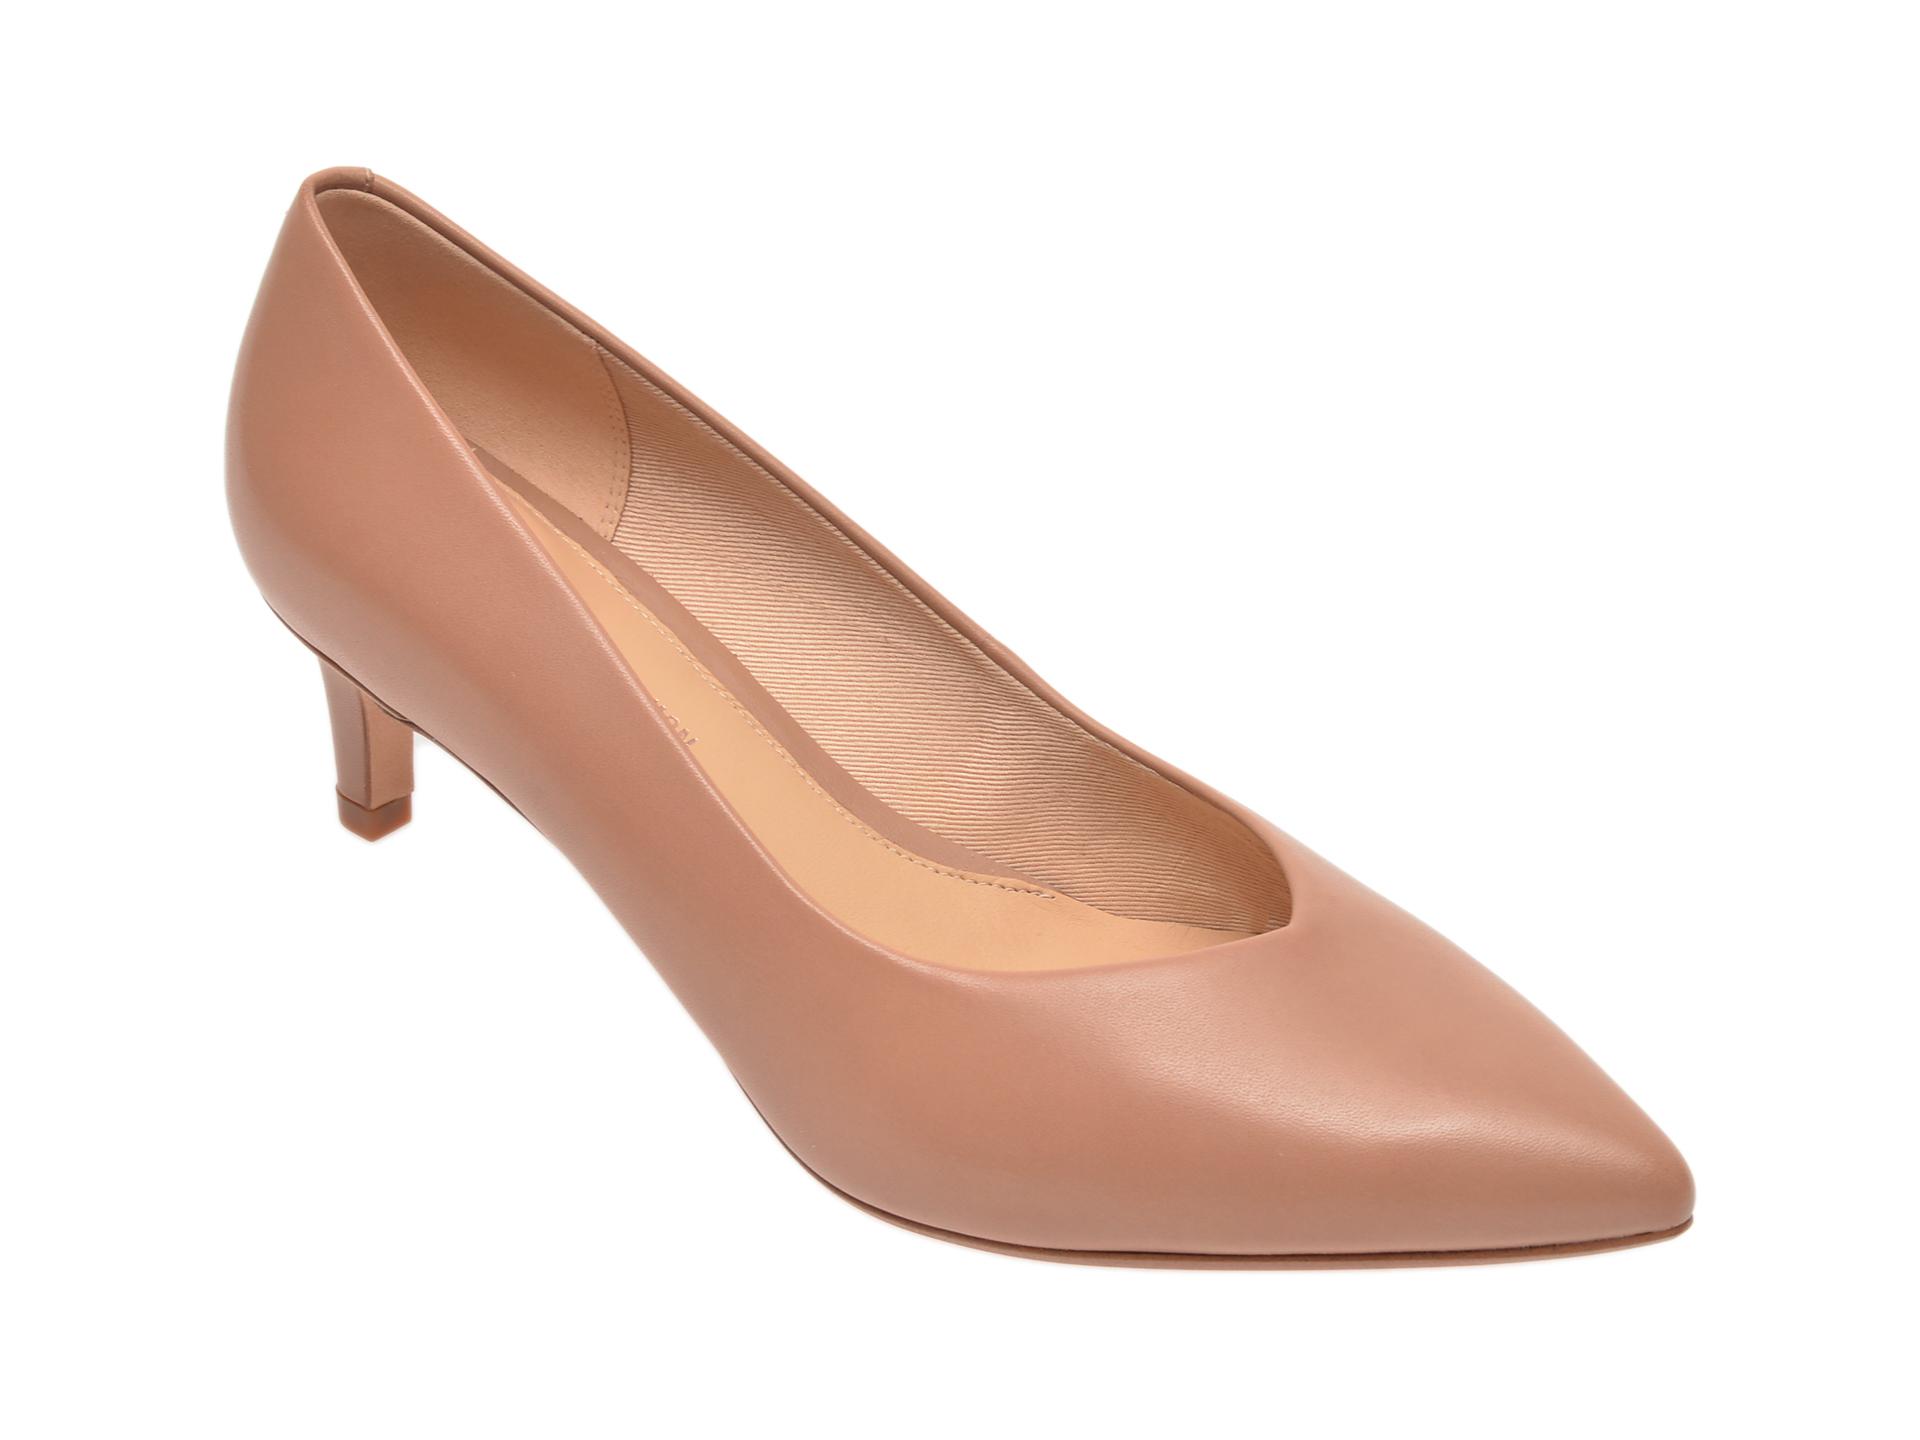 Pantofi CLARKS nude, Laina55 Court, din piele naturala